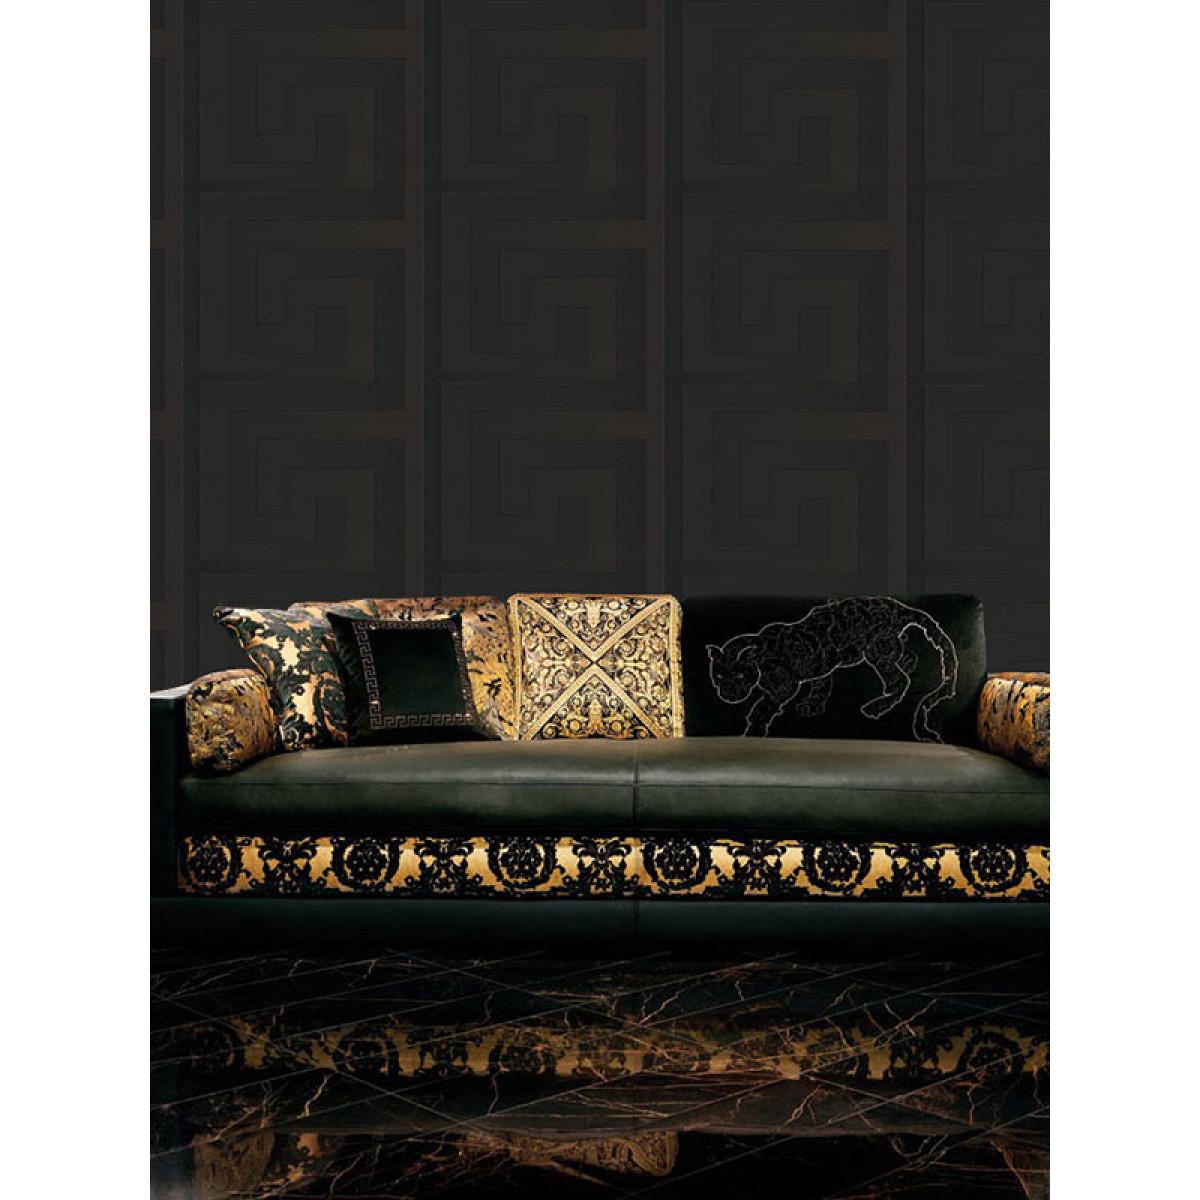 Versace Greek Key Wallpaper 10m X 70cm Black 93523 4